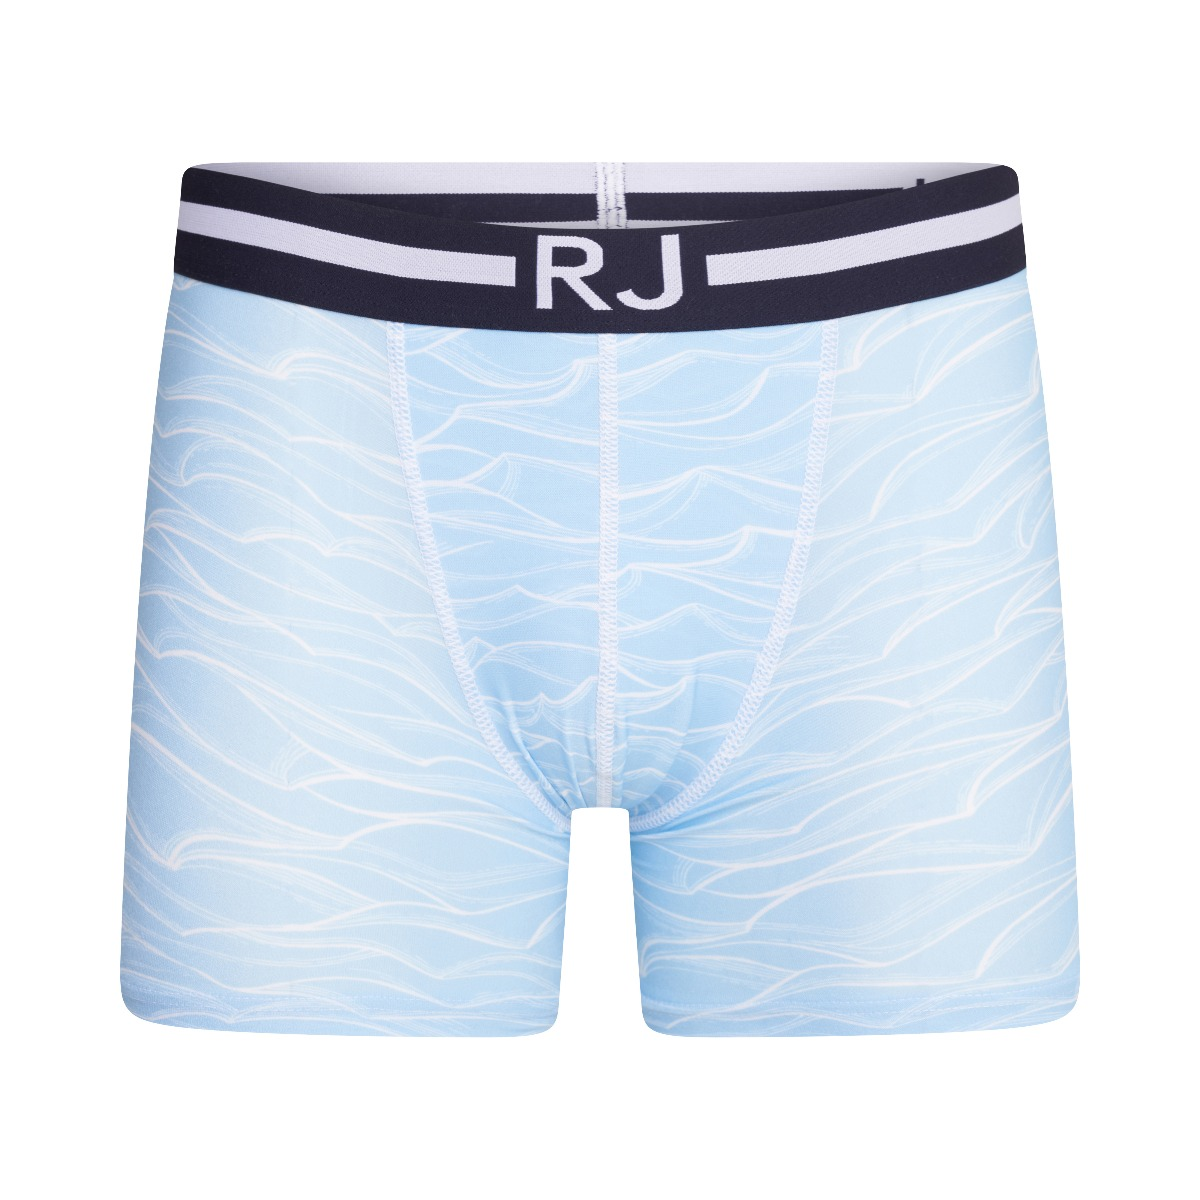 RJ Pure Fashion Heren Boxershort Sea S